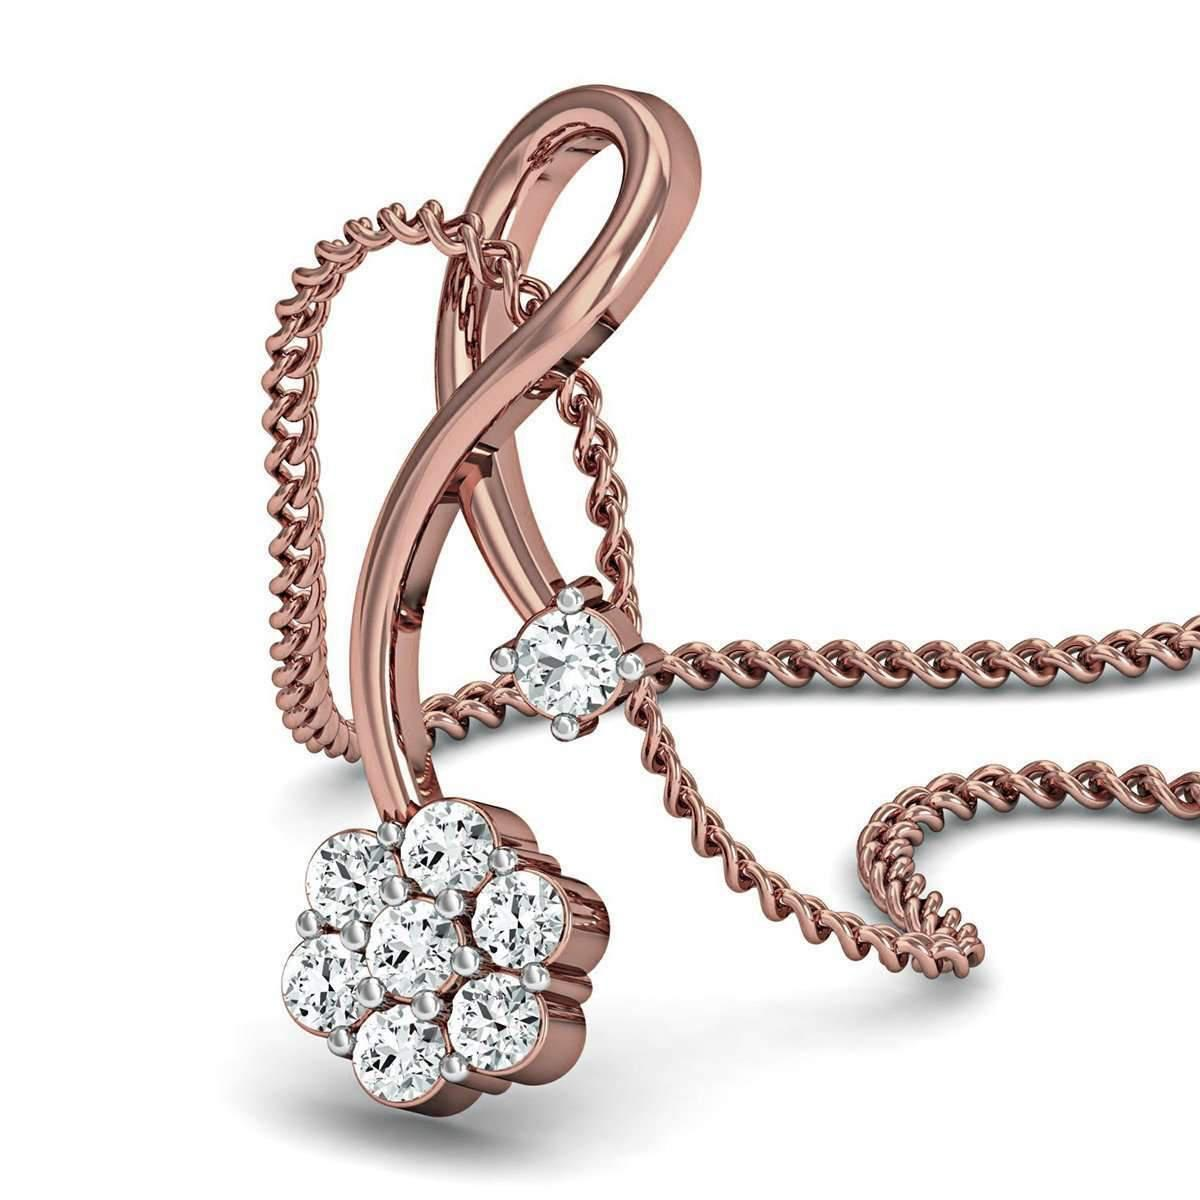 Diamoire Jewels Prong set Diamond Pendant Hand-hammered in Premium 10kt Rose Gold QLKvpU3QA